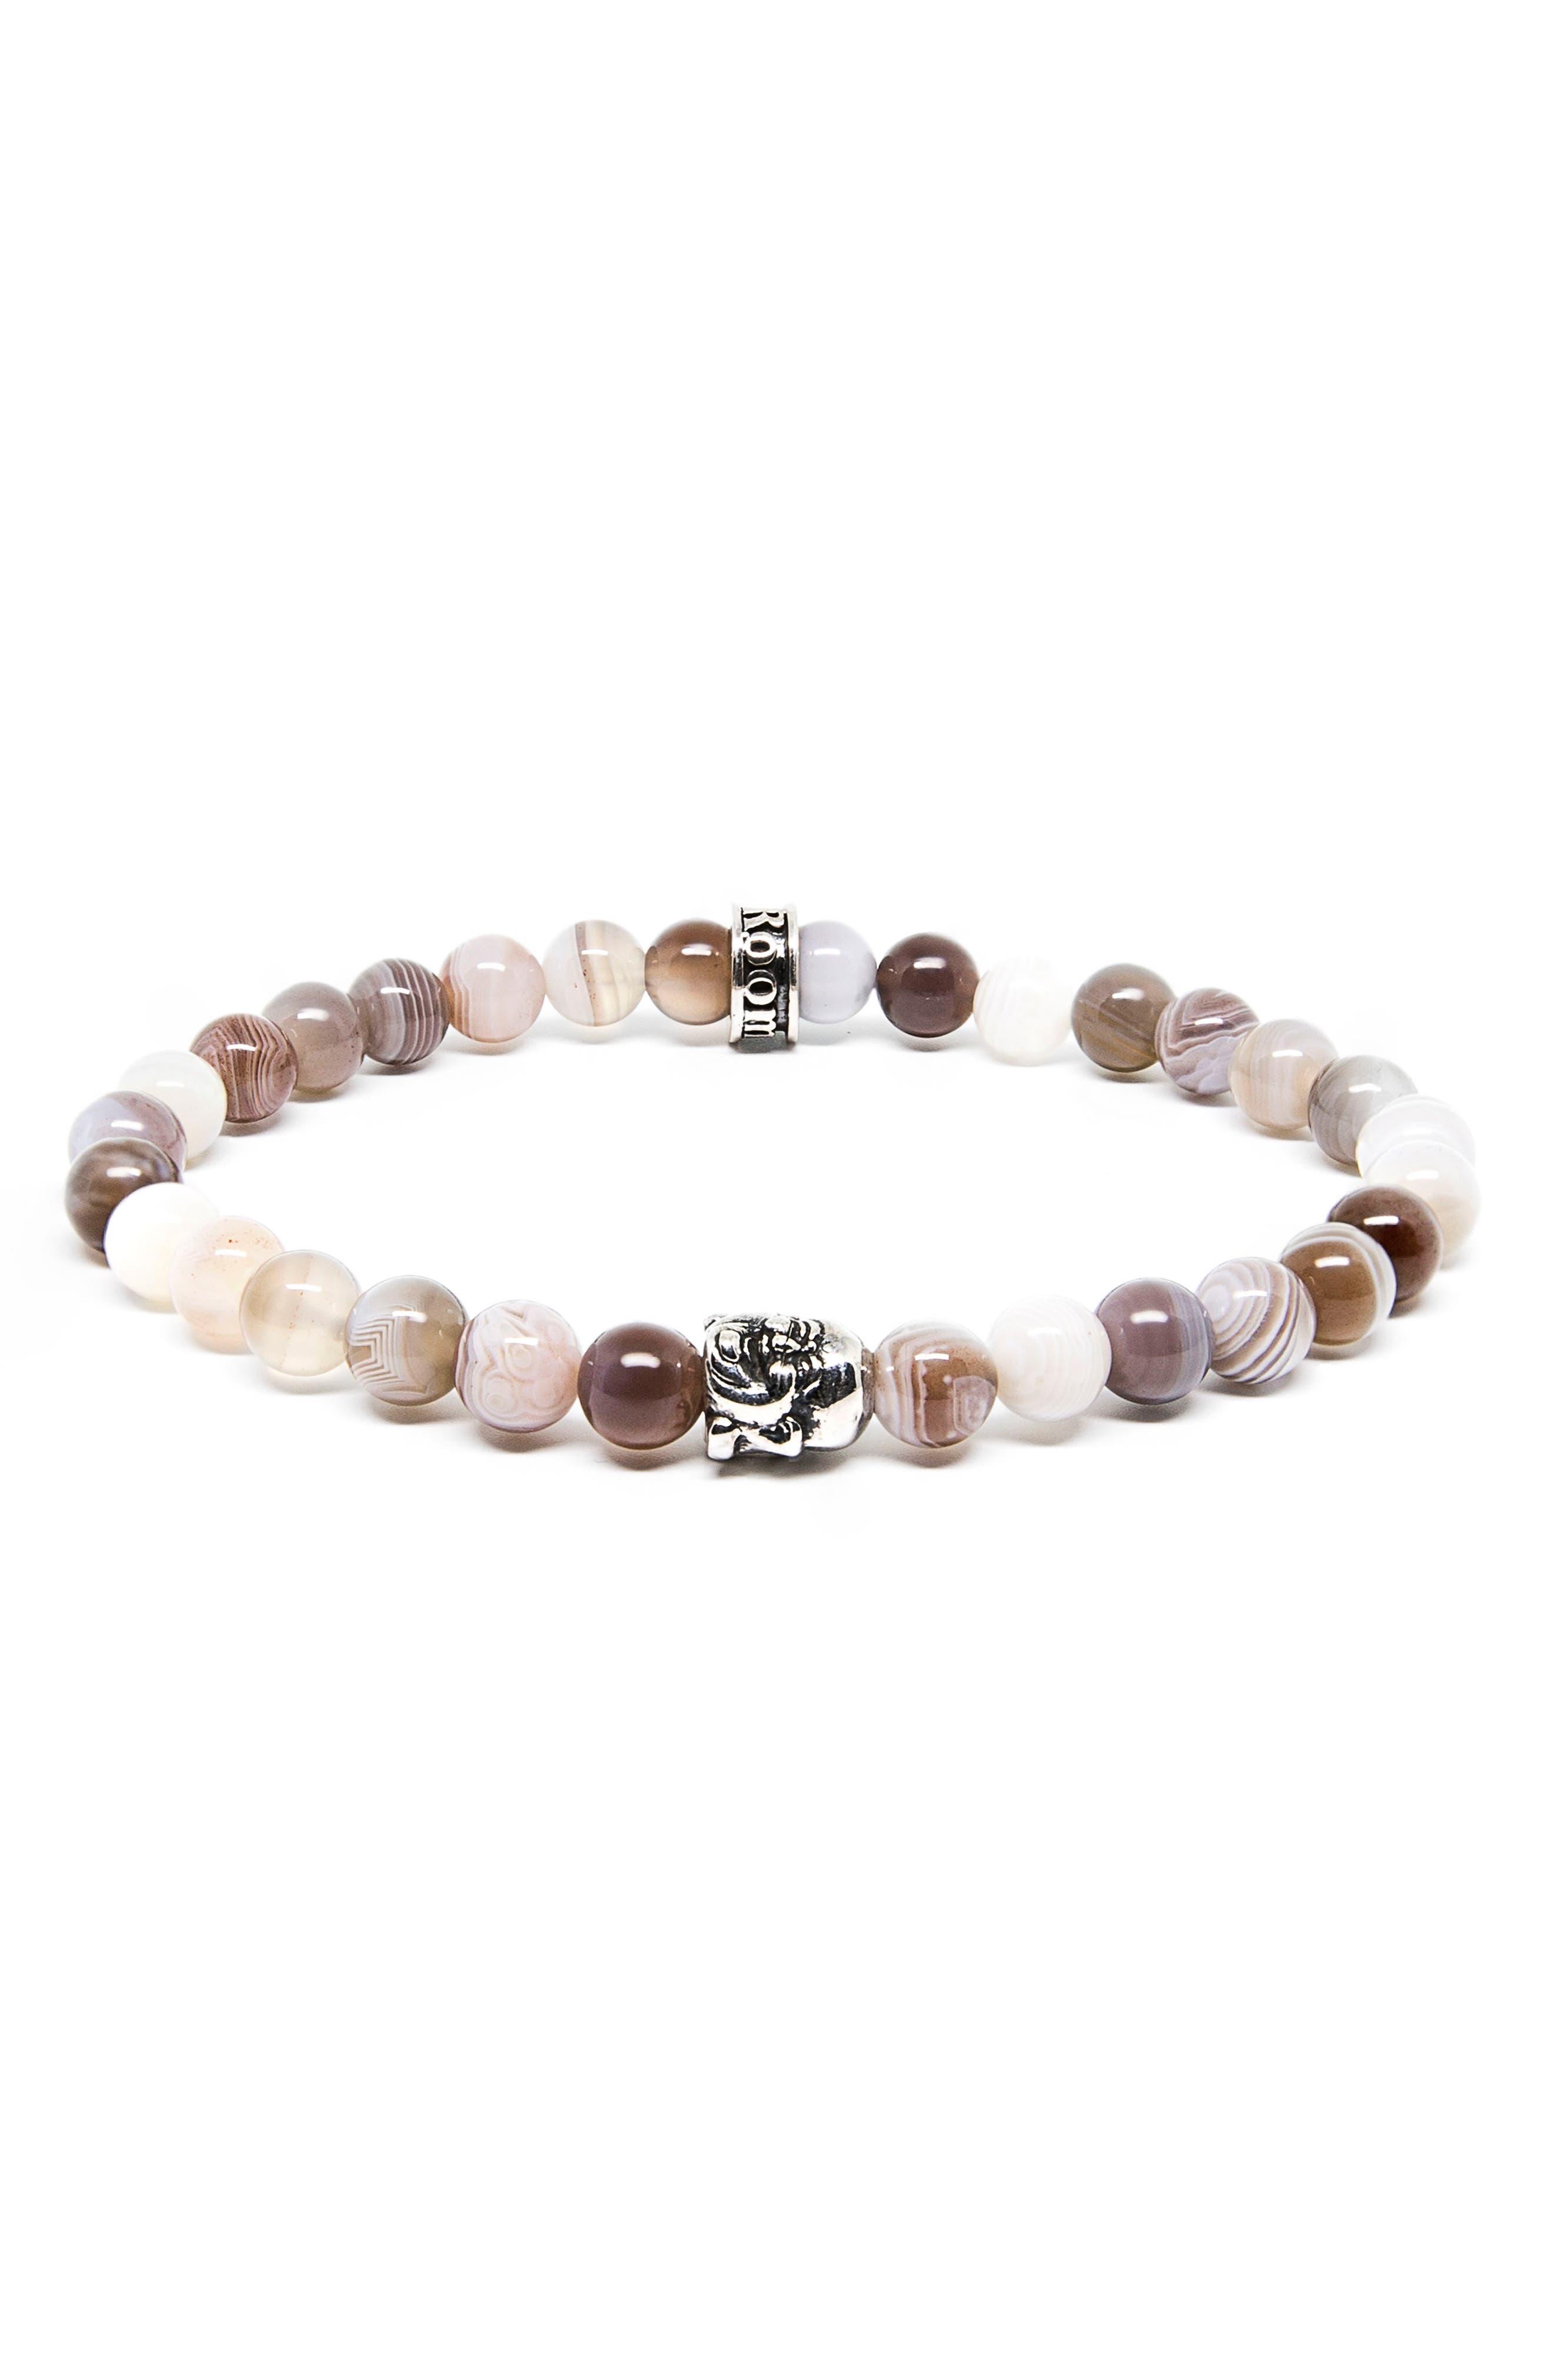 Agate Buddha Stretch Bracelet,                         Main,                         color, Grey